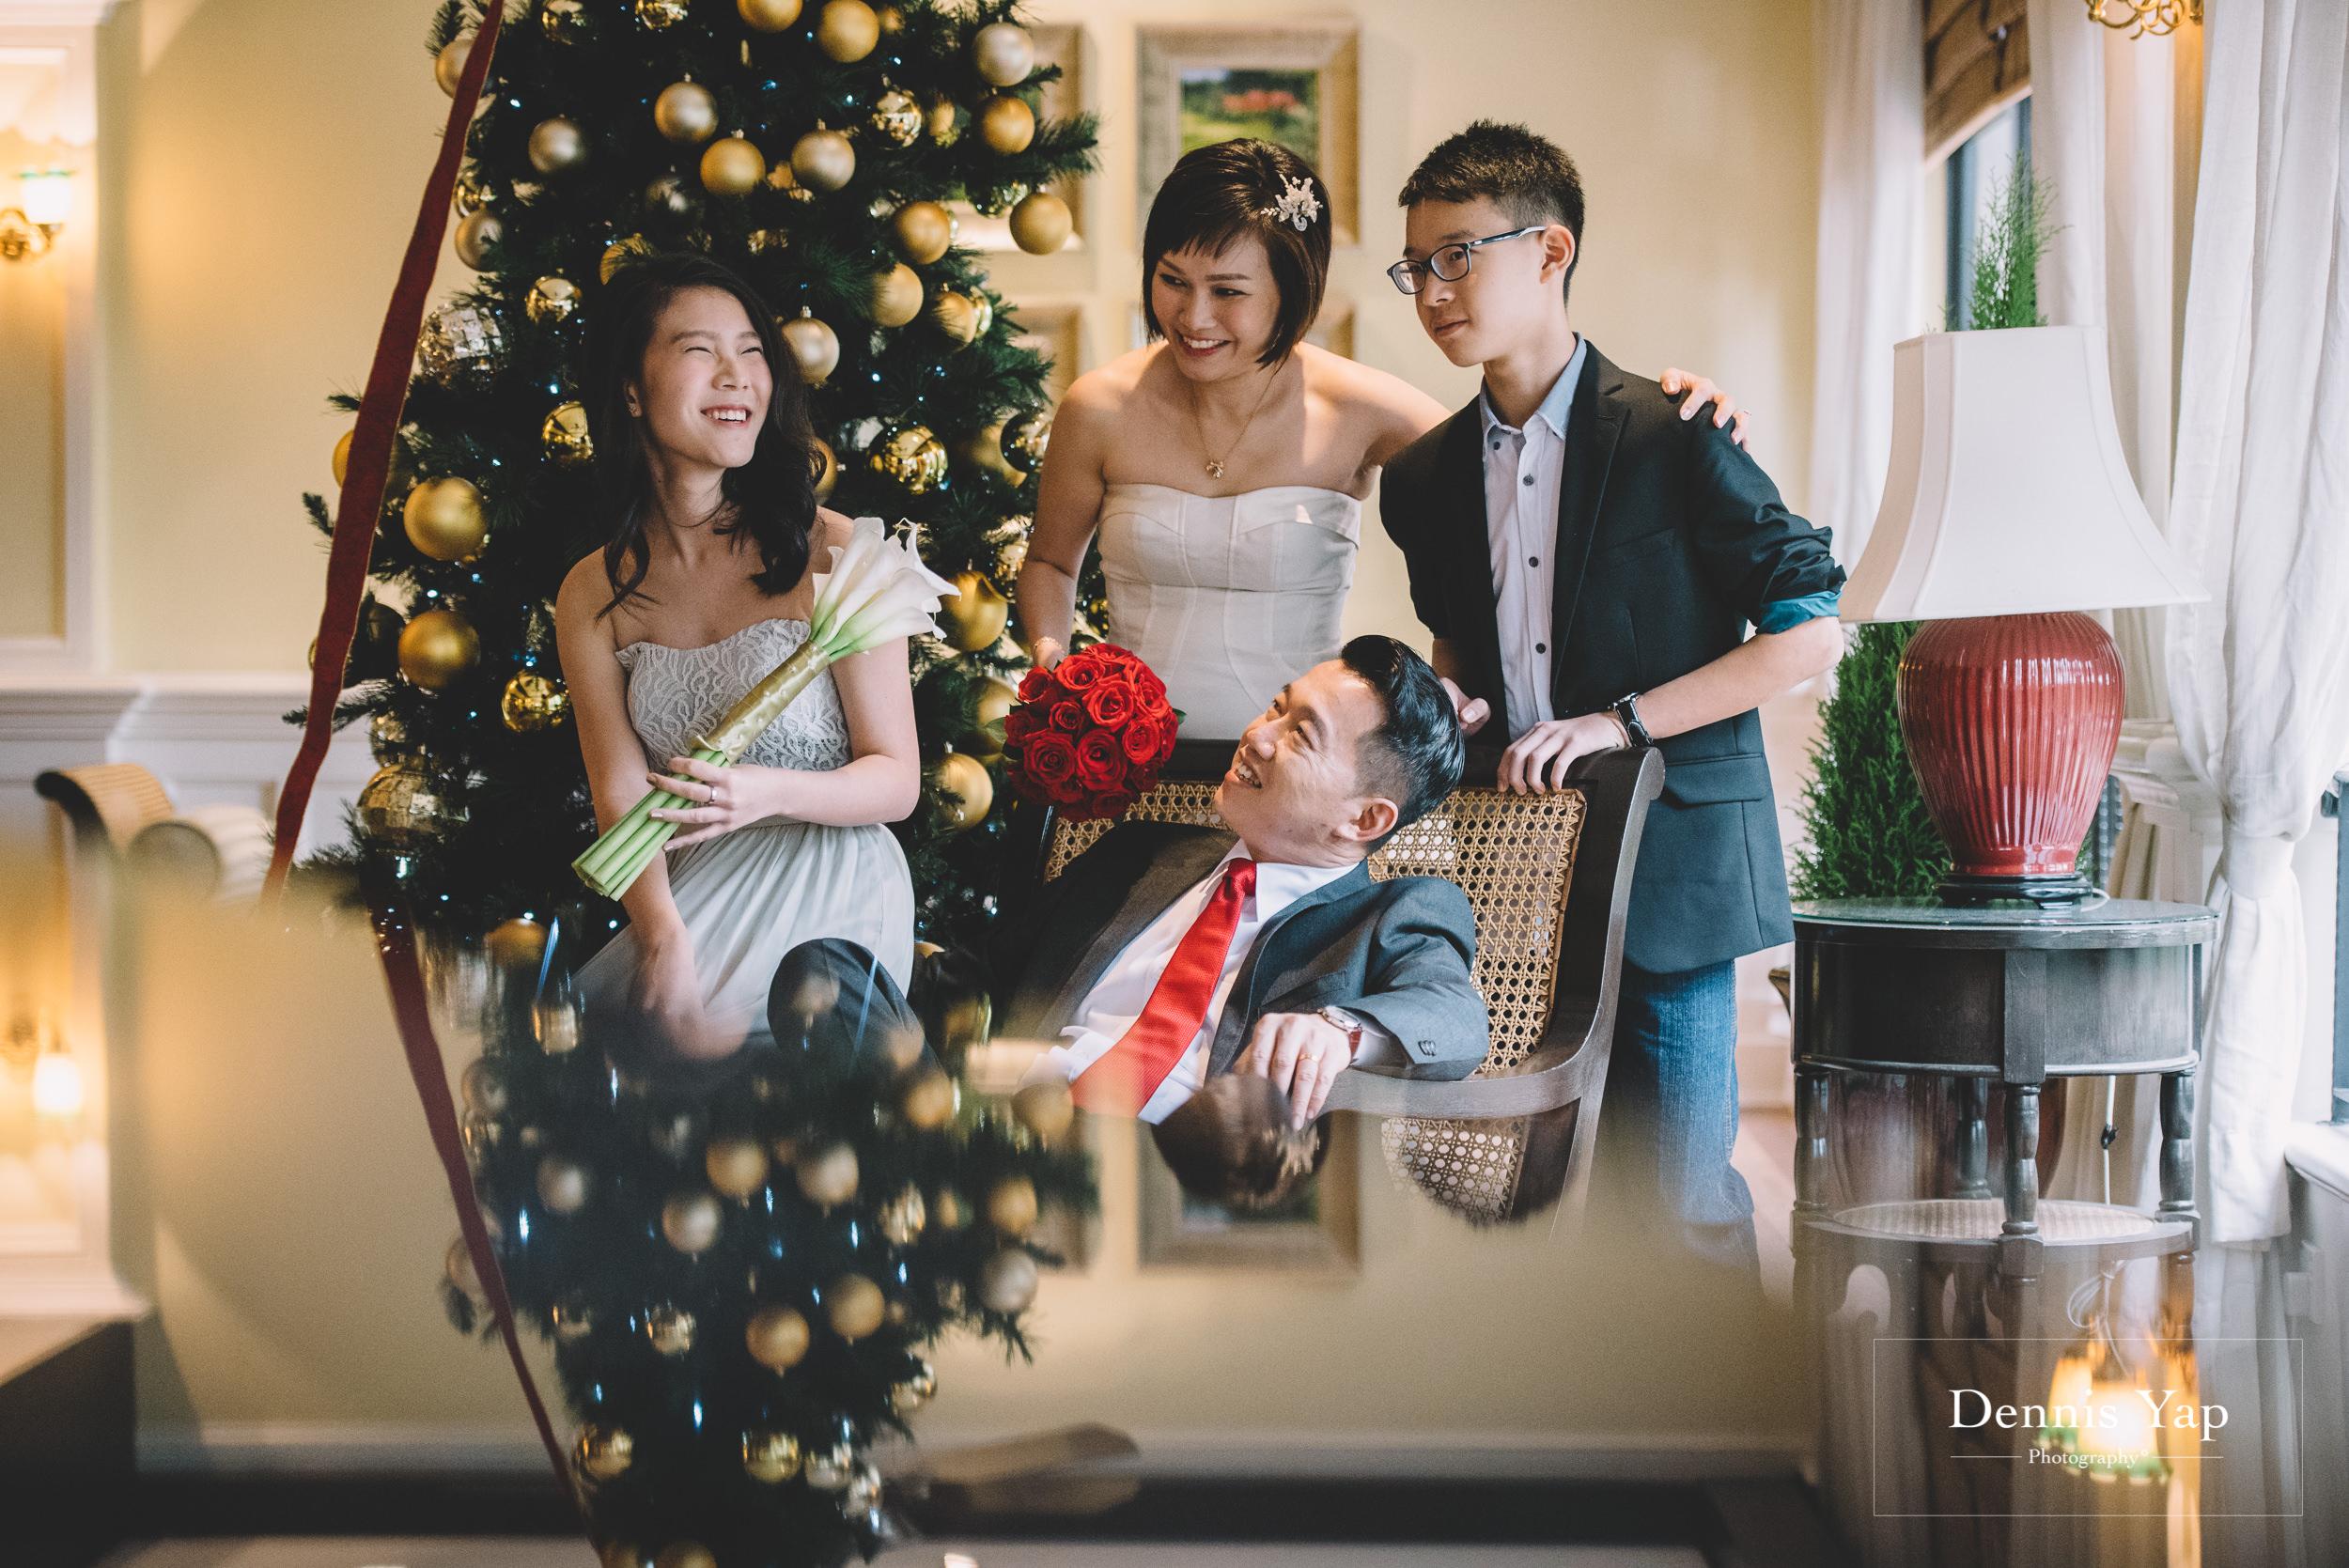 boon weng cyndy love family values pre wedding cameron highlands smoke house dennis yap photography-72.jpg